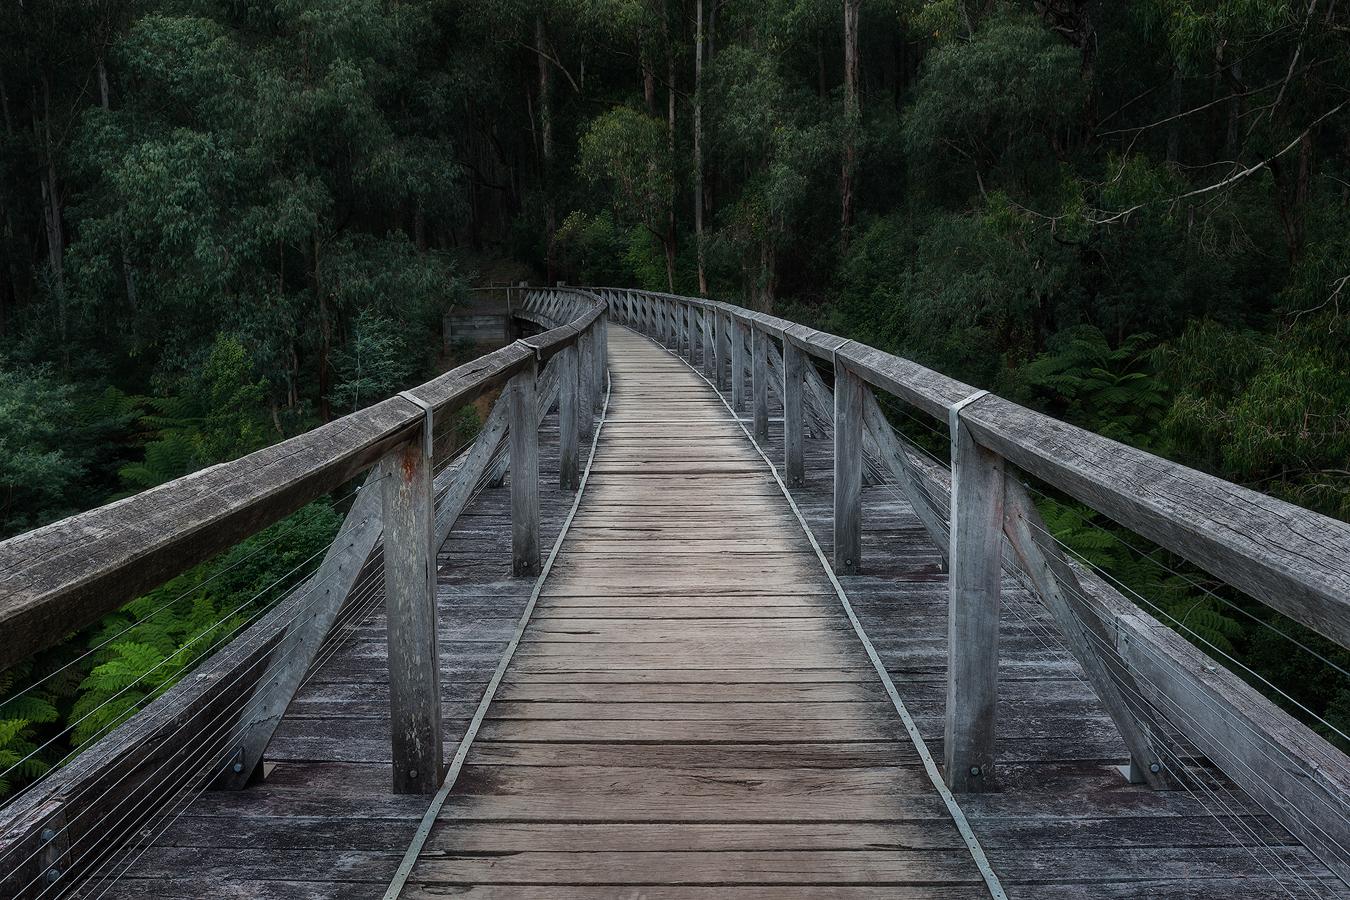 Noojee Trestle Bridge Toorongo Falls | 1 Day Waterfall Photography Workshop | We Are Raw Photography